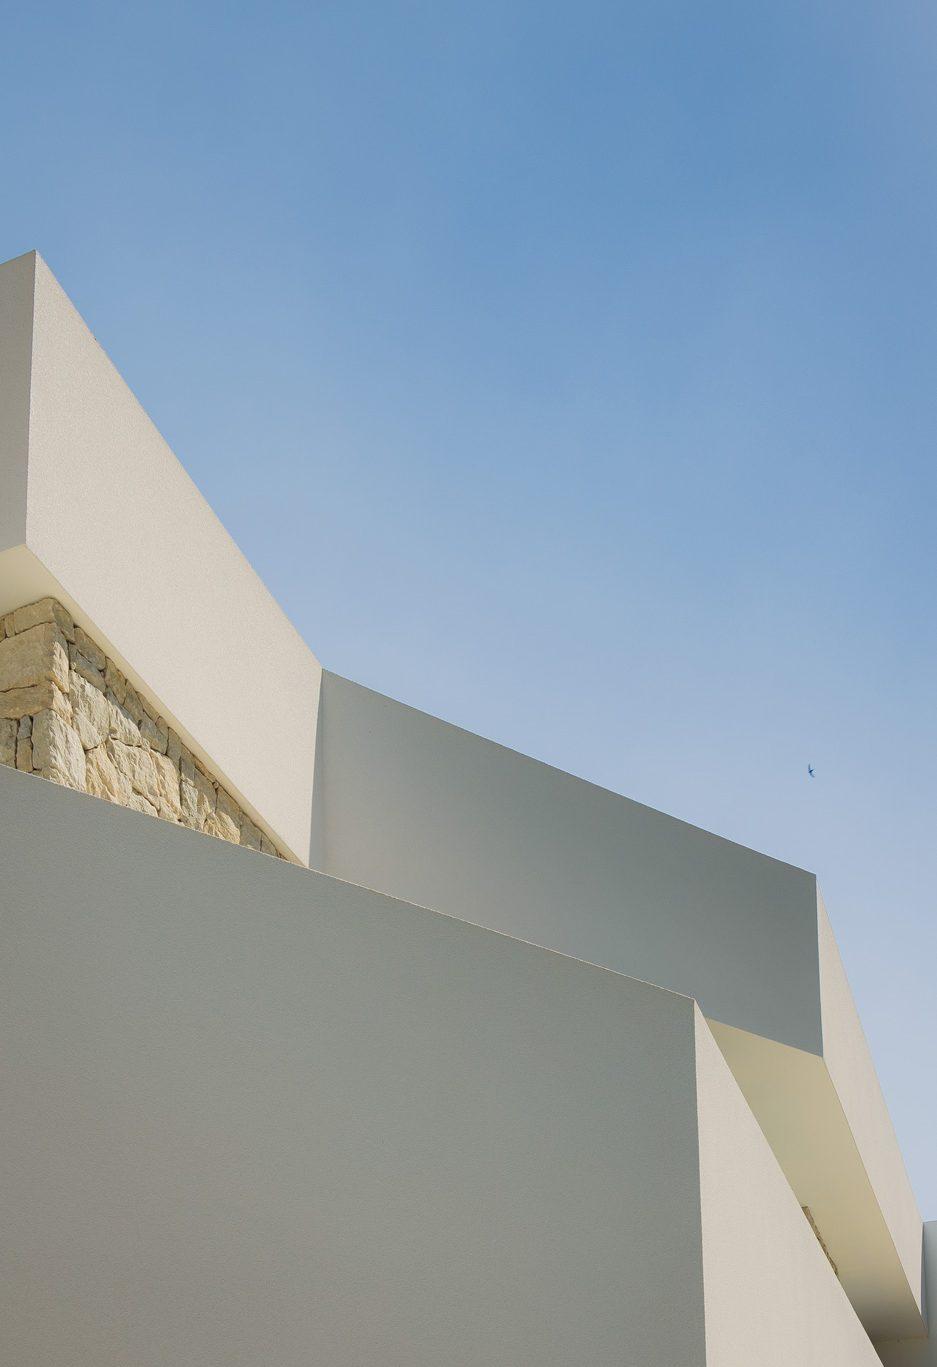 Teoina-Chalet-Moderno-Rocafort-Chiralt-Arquitectos-Valencia